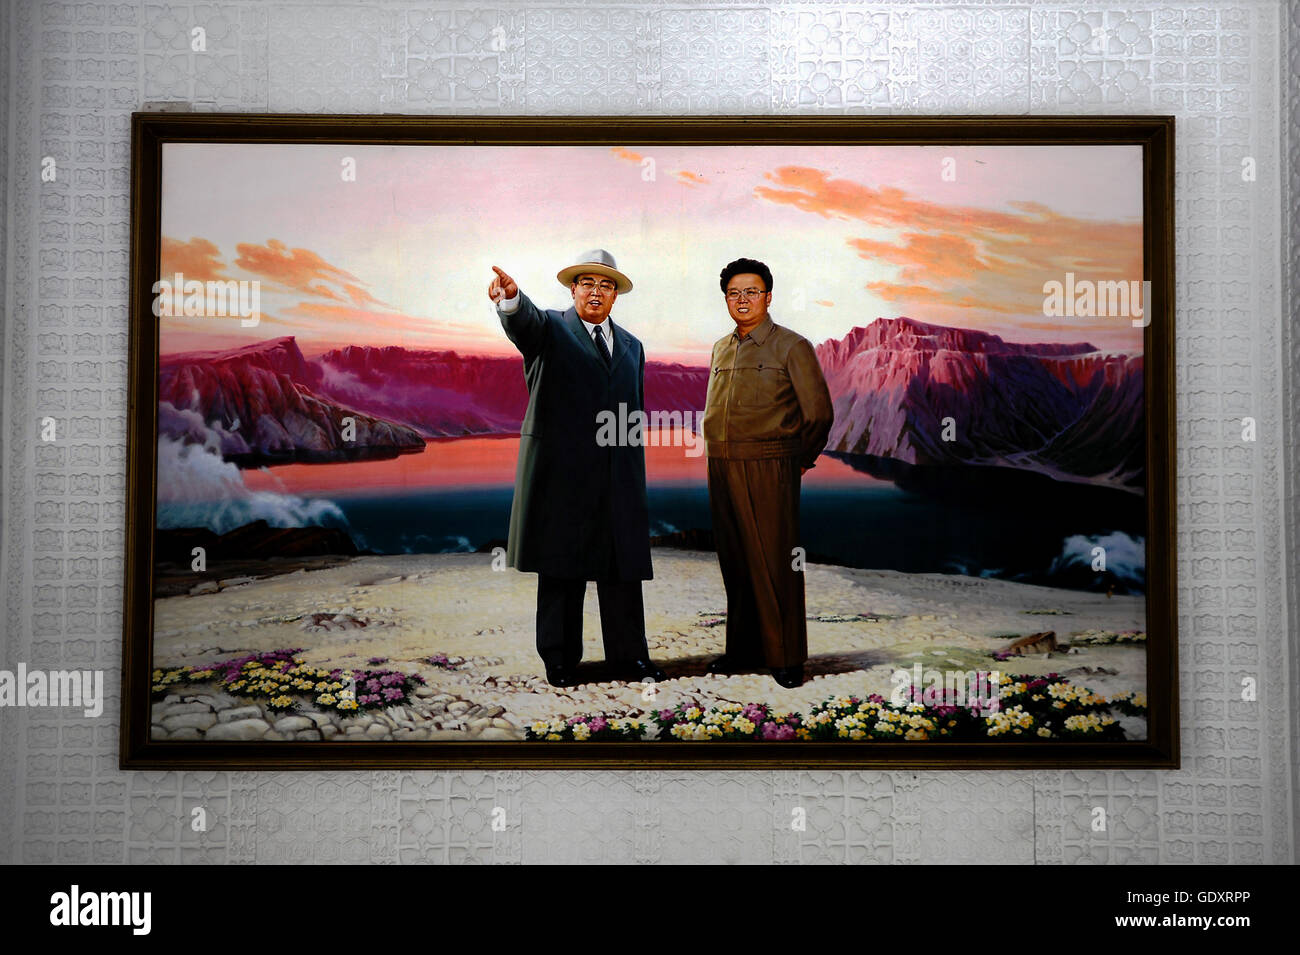 NORTH KOREA. Sinpyong. 2012. Painting of Kim Il Sung and Kim Jong Il - Stock Image